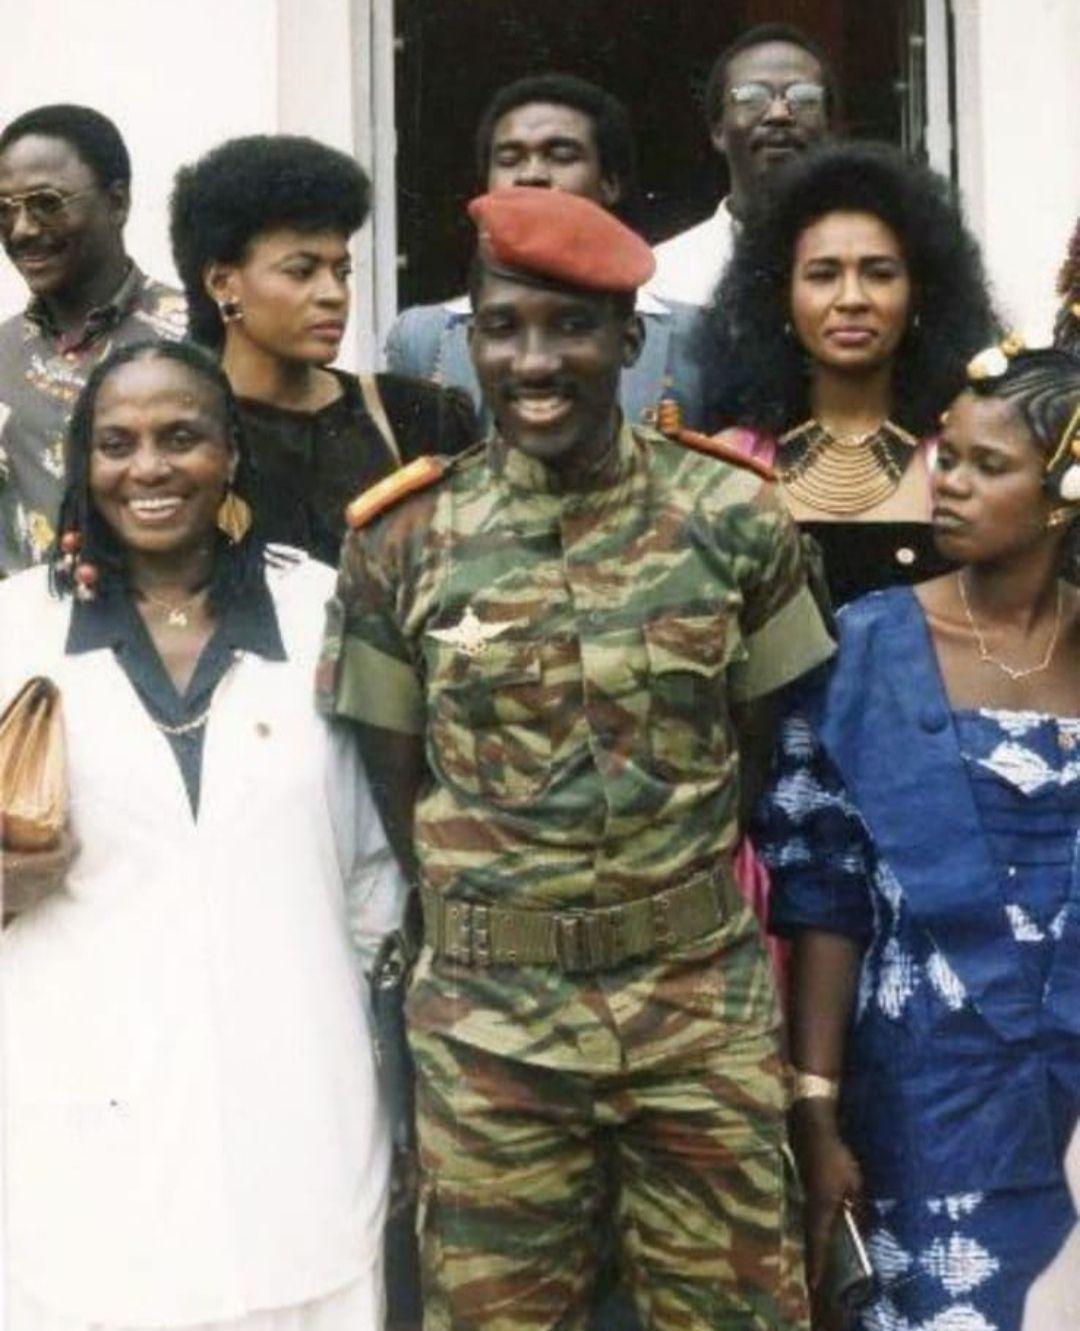 Le choc des stars en 1986 au Burkina Faso